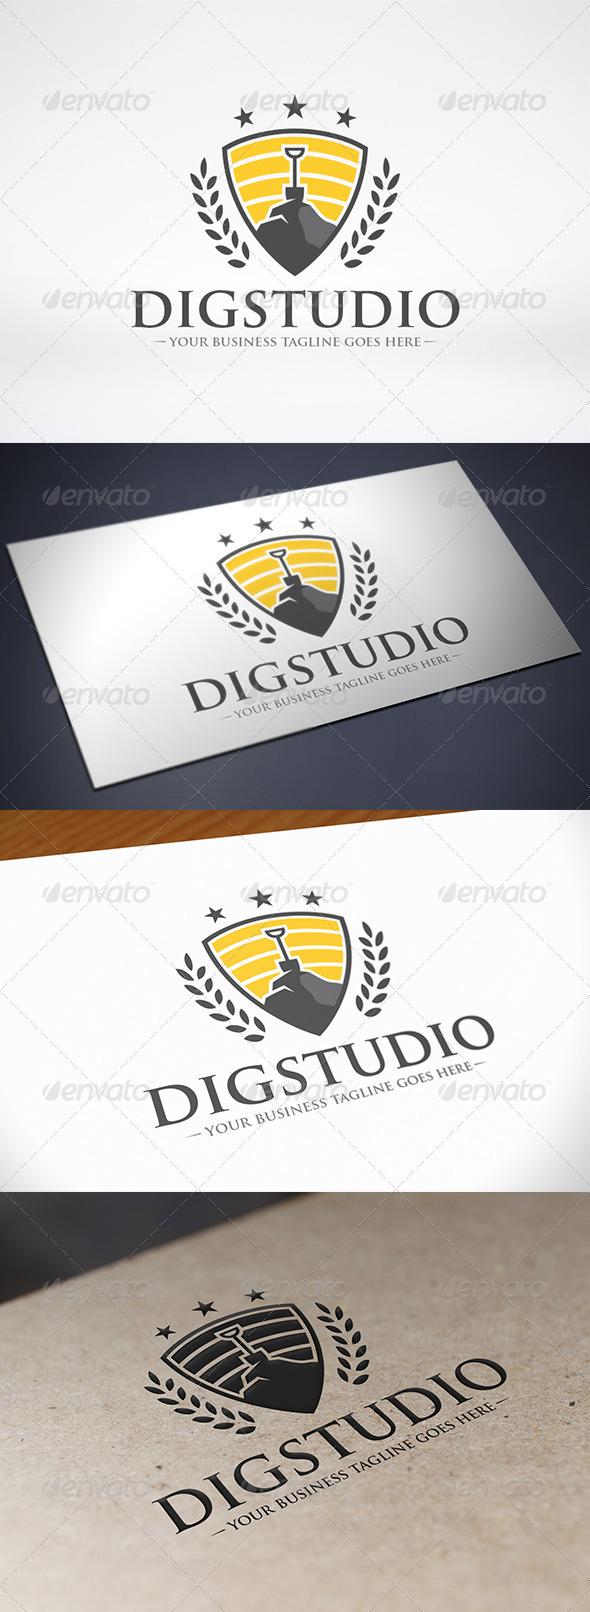 GraphicRiver Dig Studio Logo Template 8686385